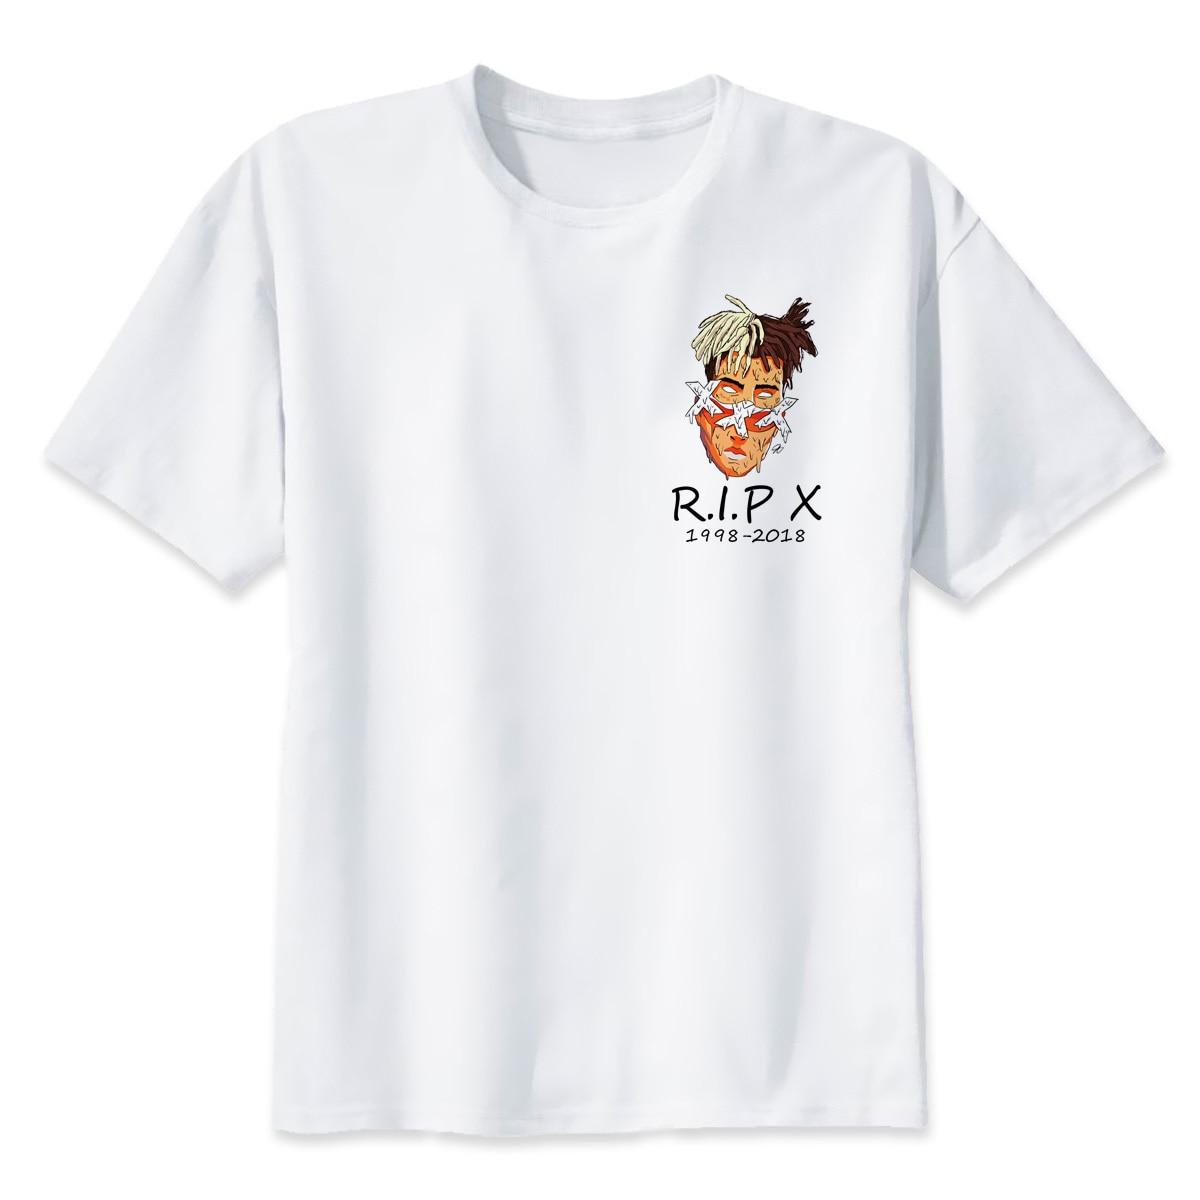 Xxxtentacion R.I.P personaje impreso camiseta moda Casual Fitness Cool  o-cuello hombres camiseta verano manga 86b28032de8